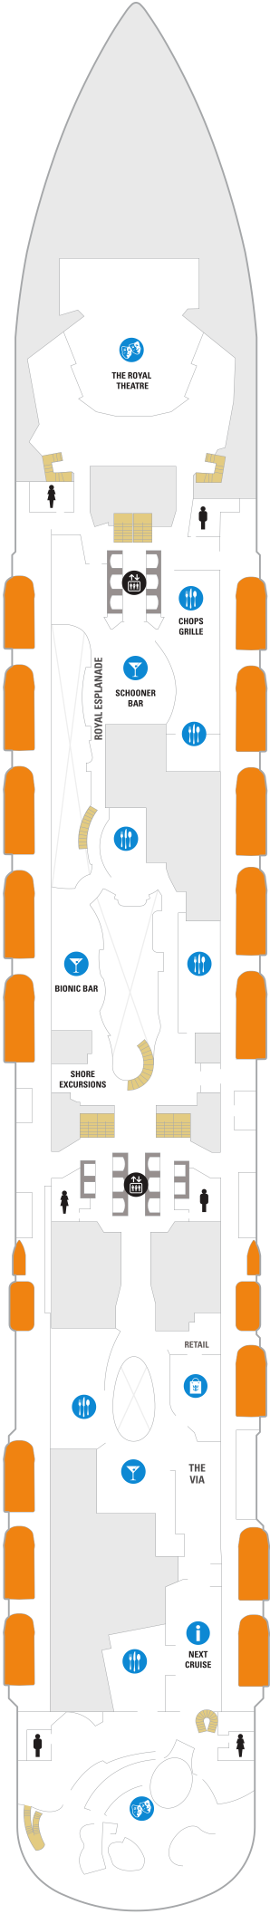 Odyssey Of The Seas Deck 5 Deck Plan